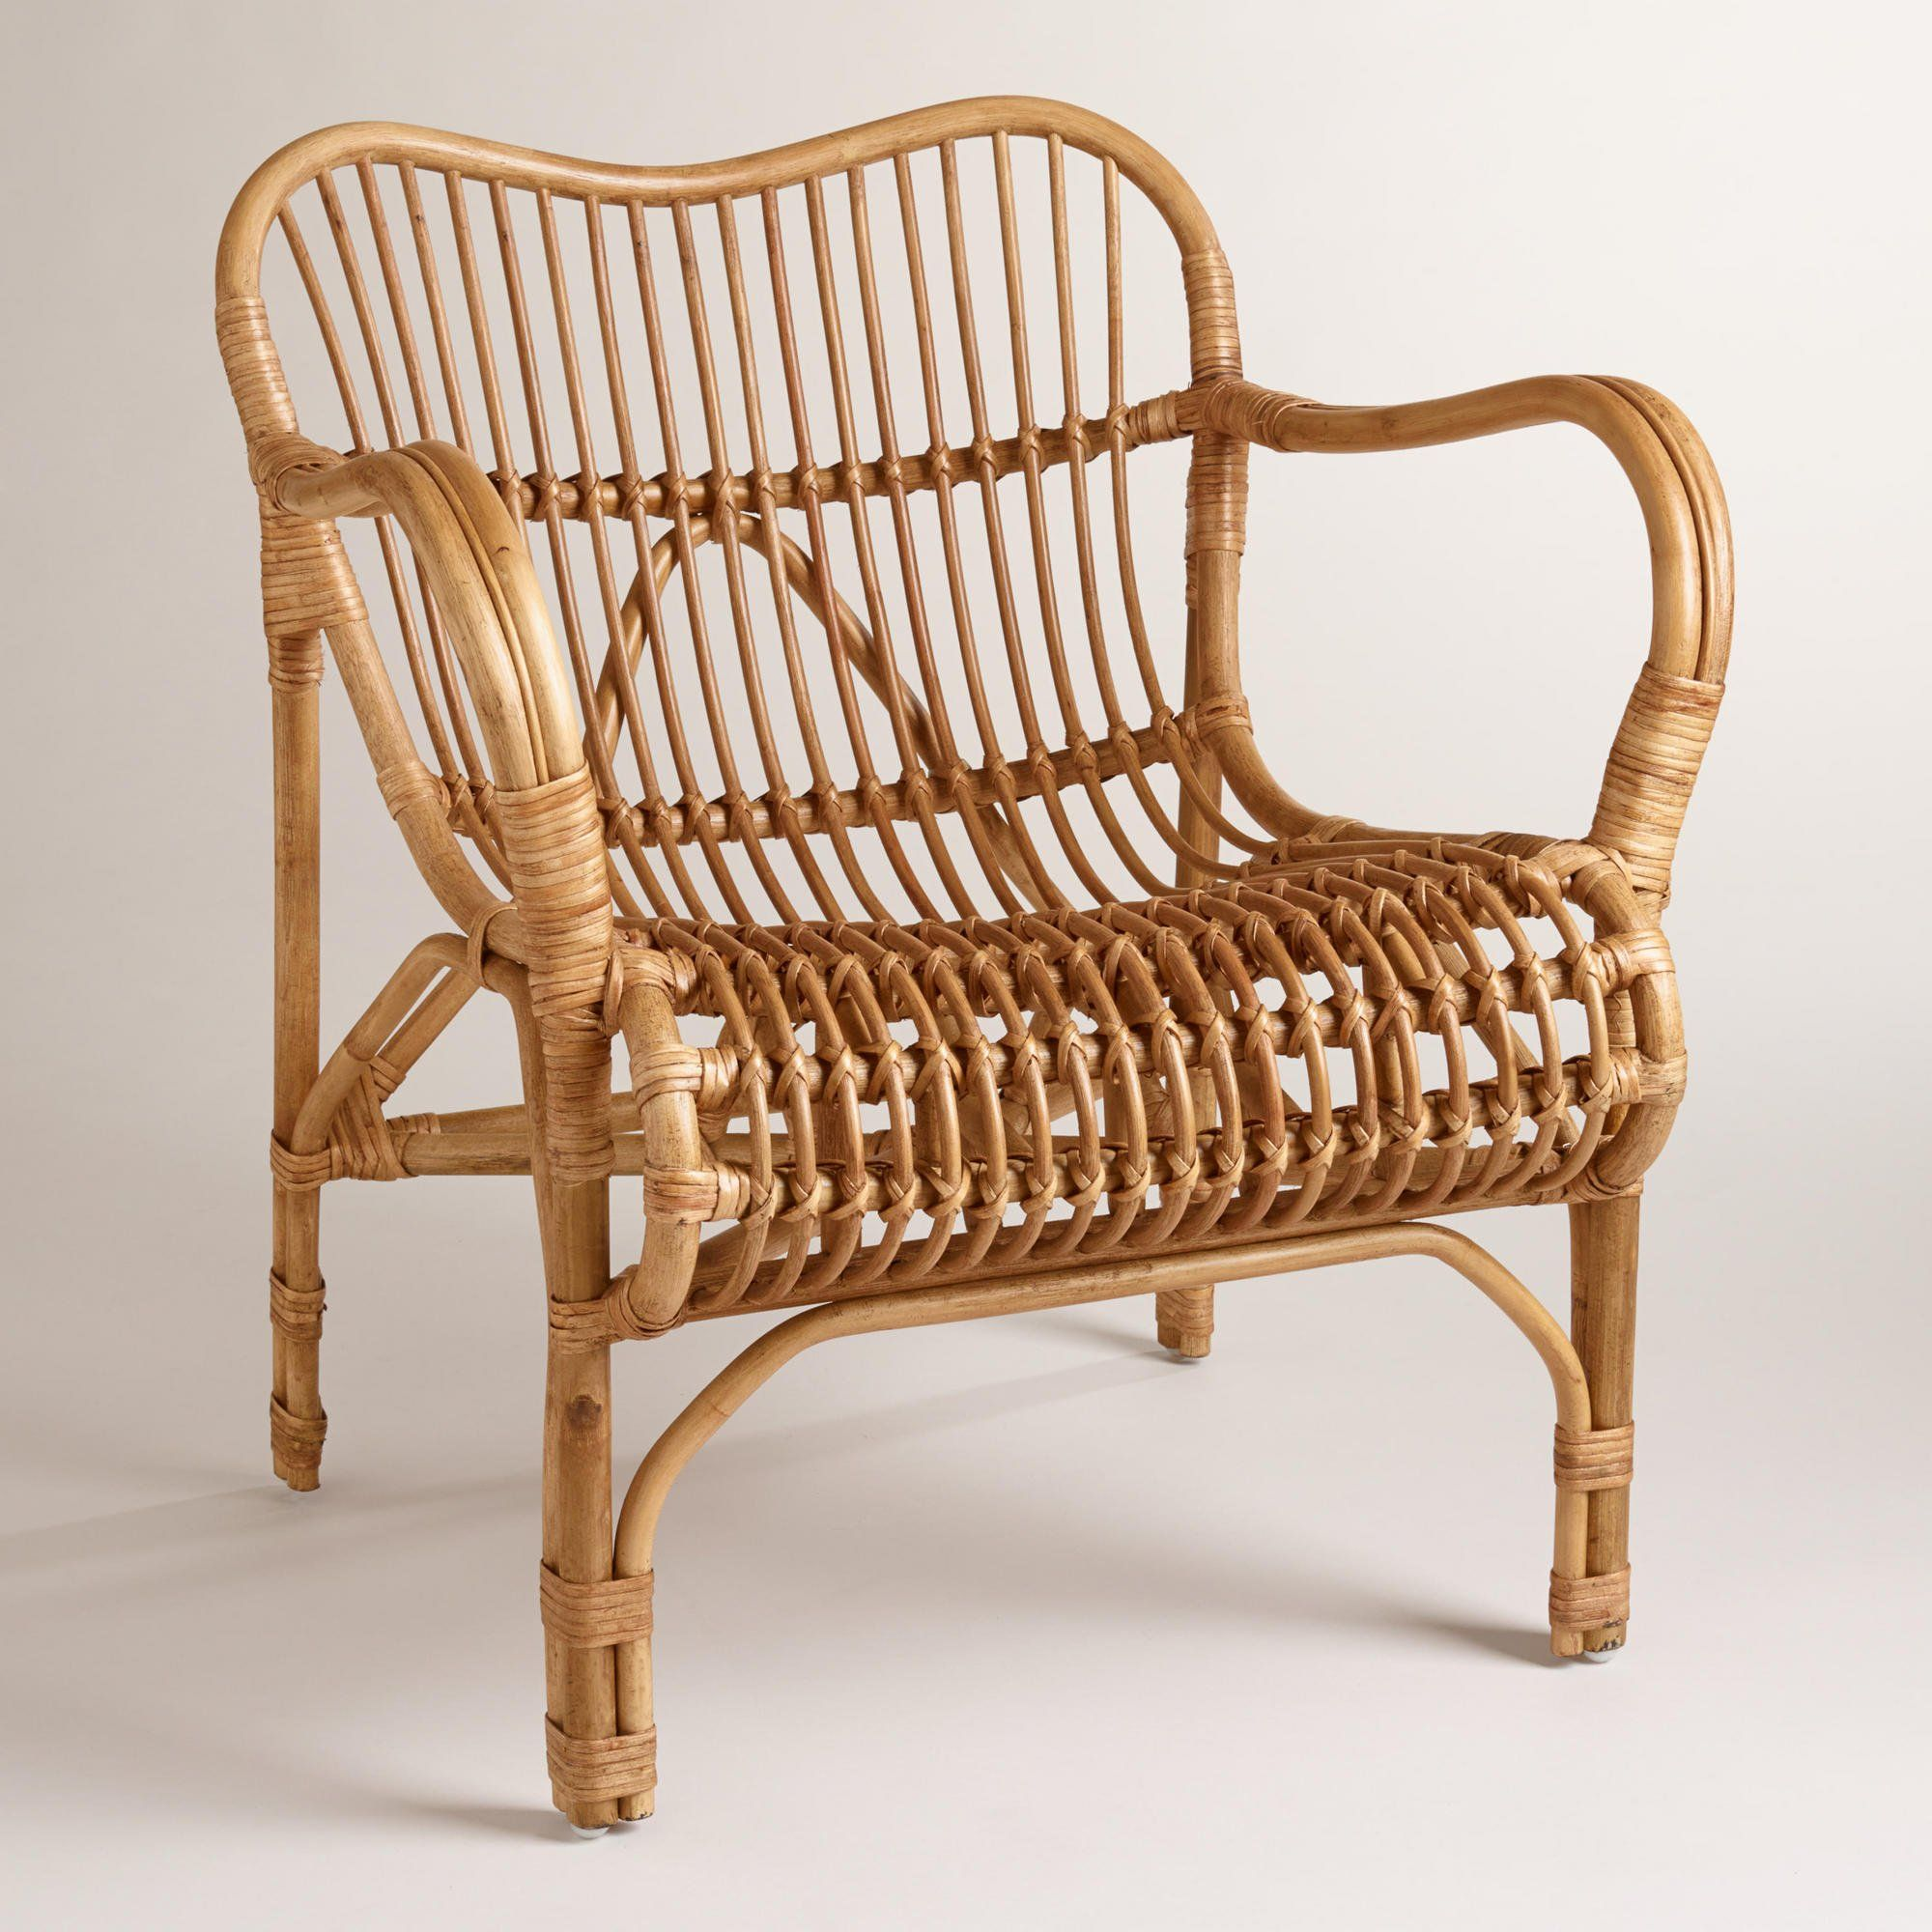 Rattan Chair Ikea Best Nursery Rocking 2018 Chairs Cole Side Pinterest